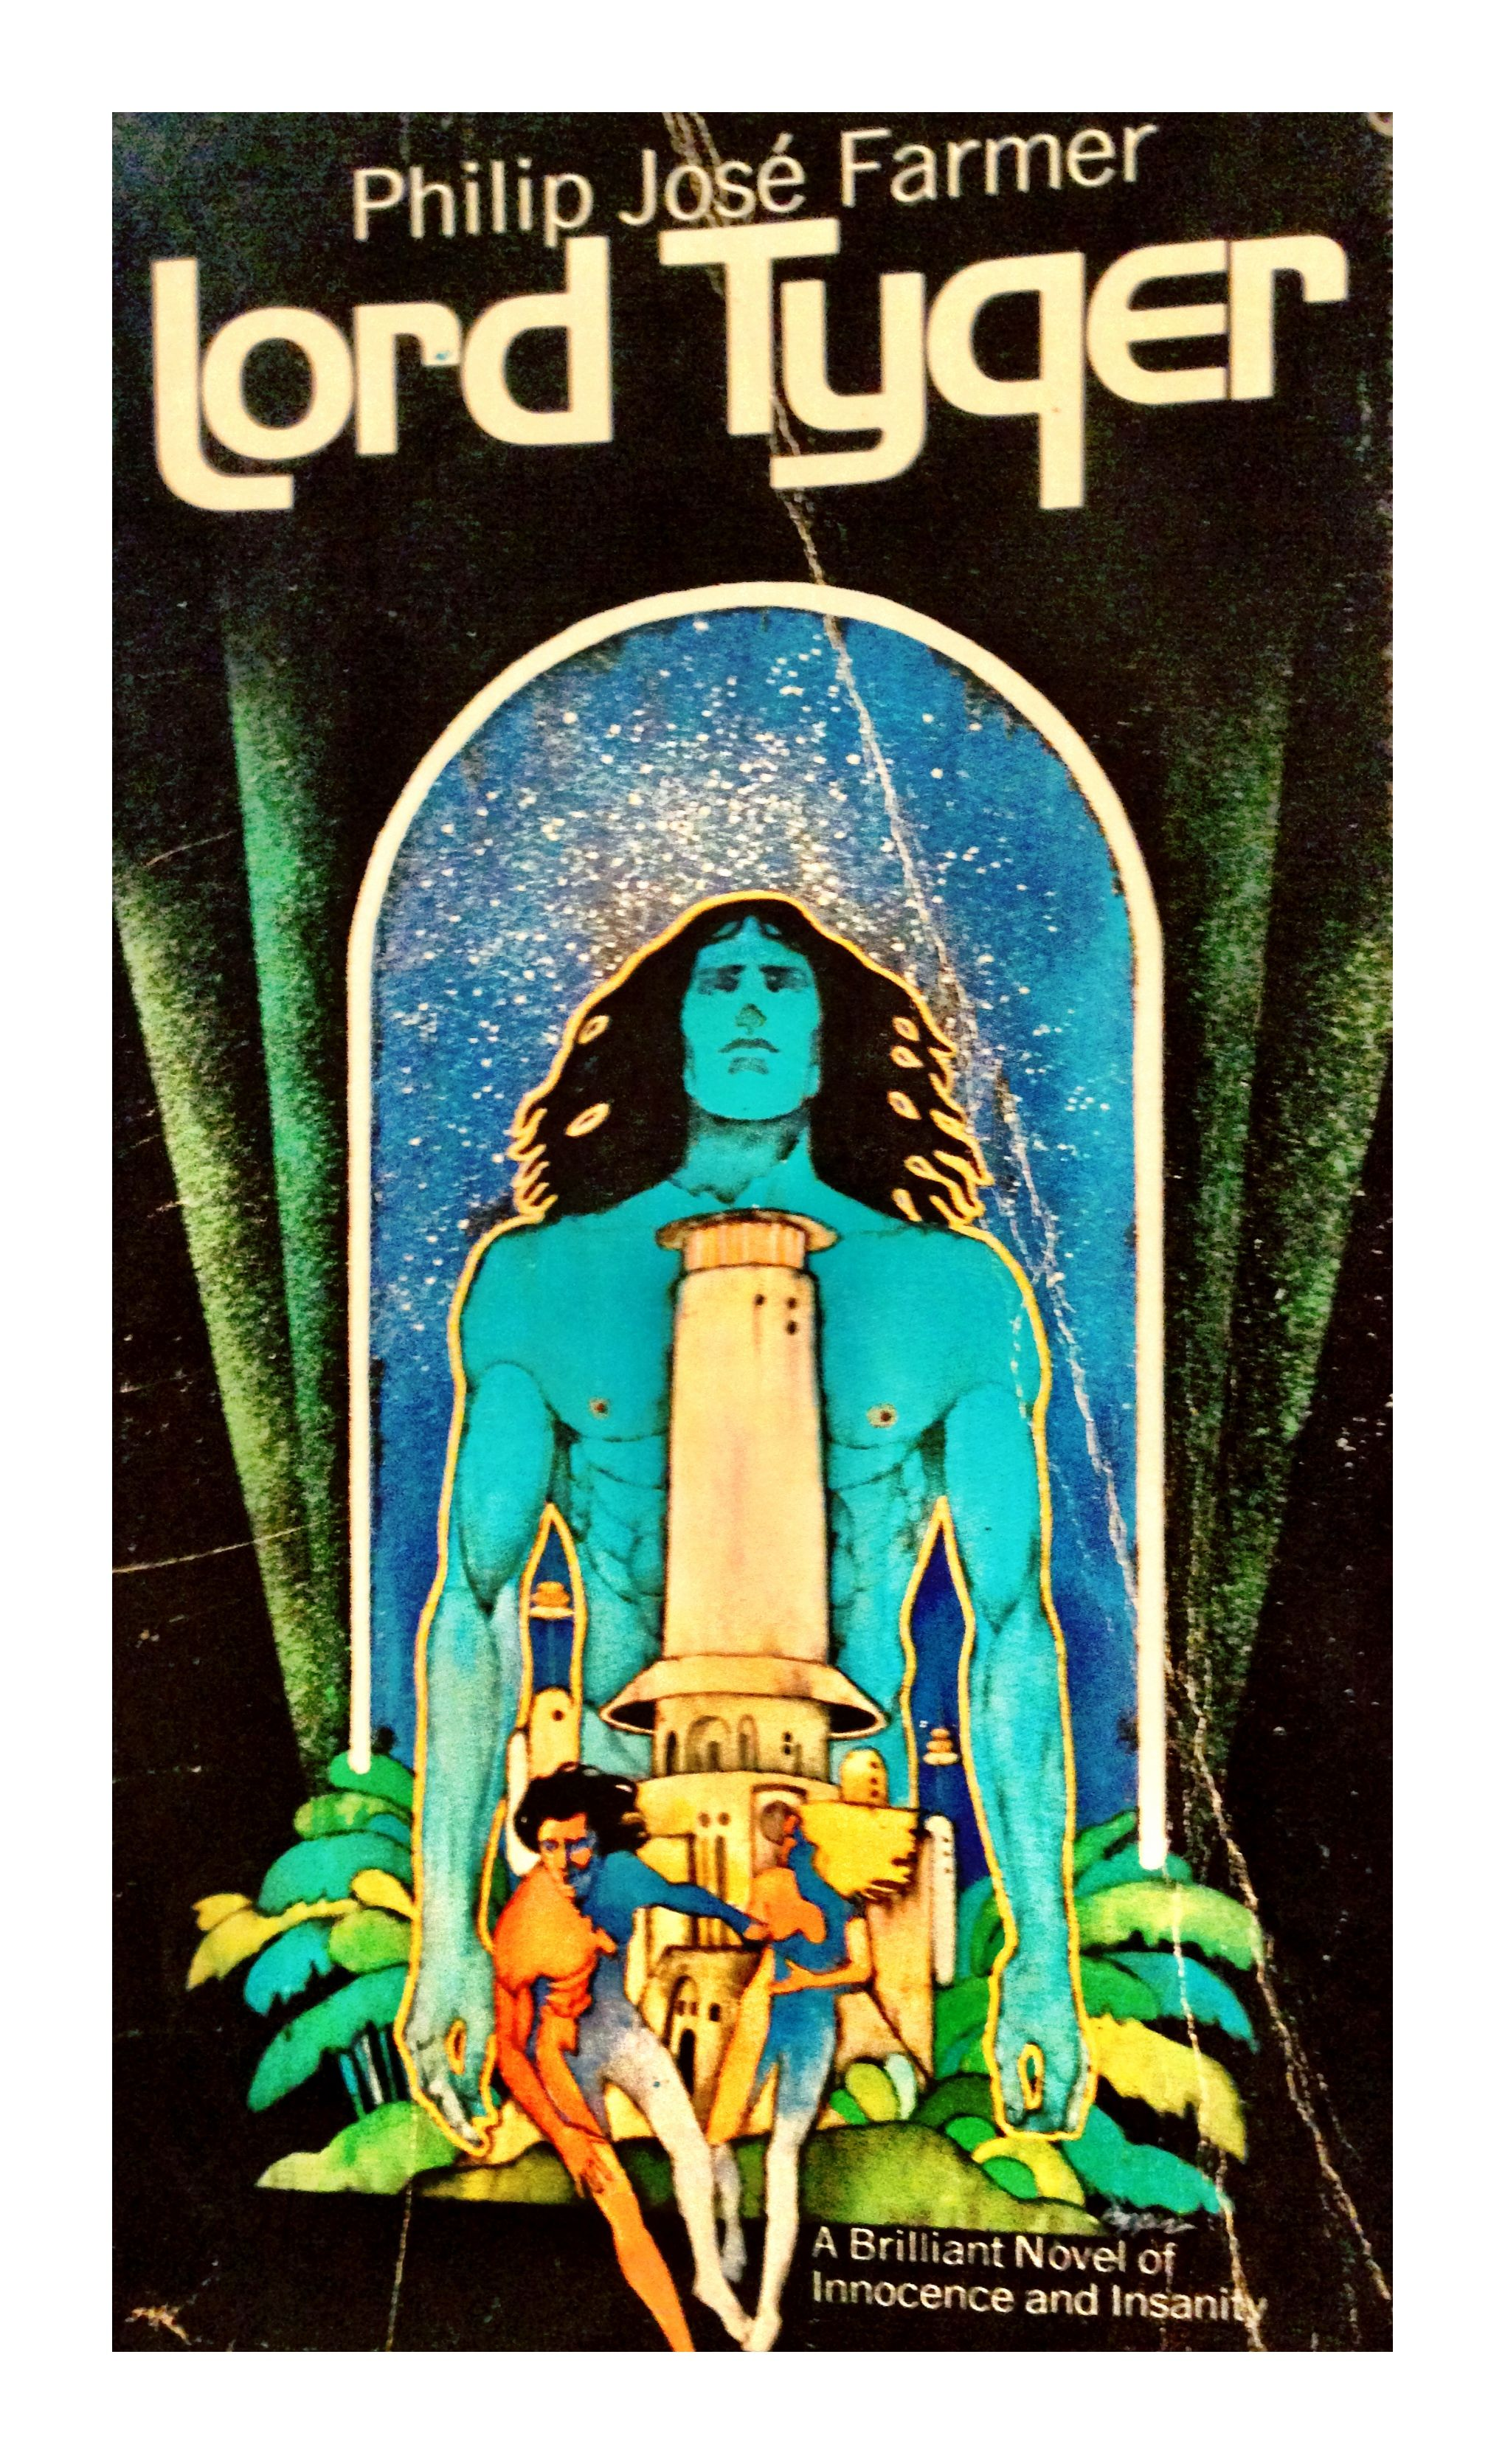 Book Cover Art Gallery : Scifi book cover sci fi paperback art gallery